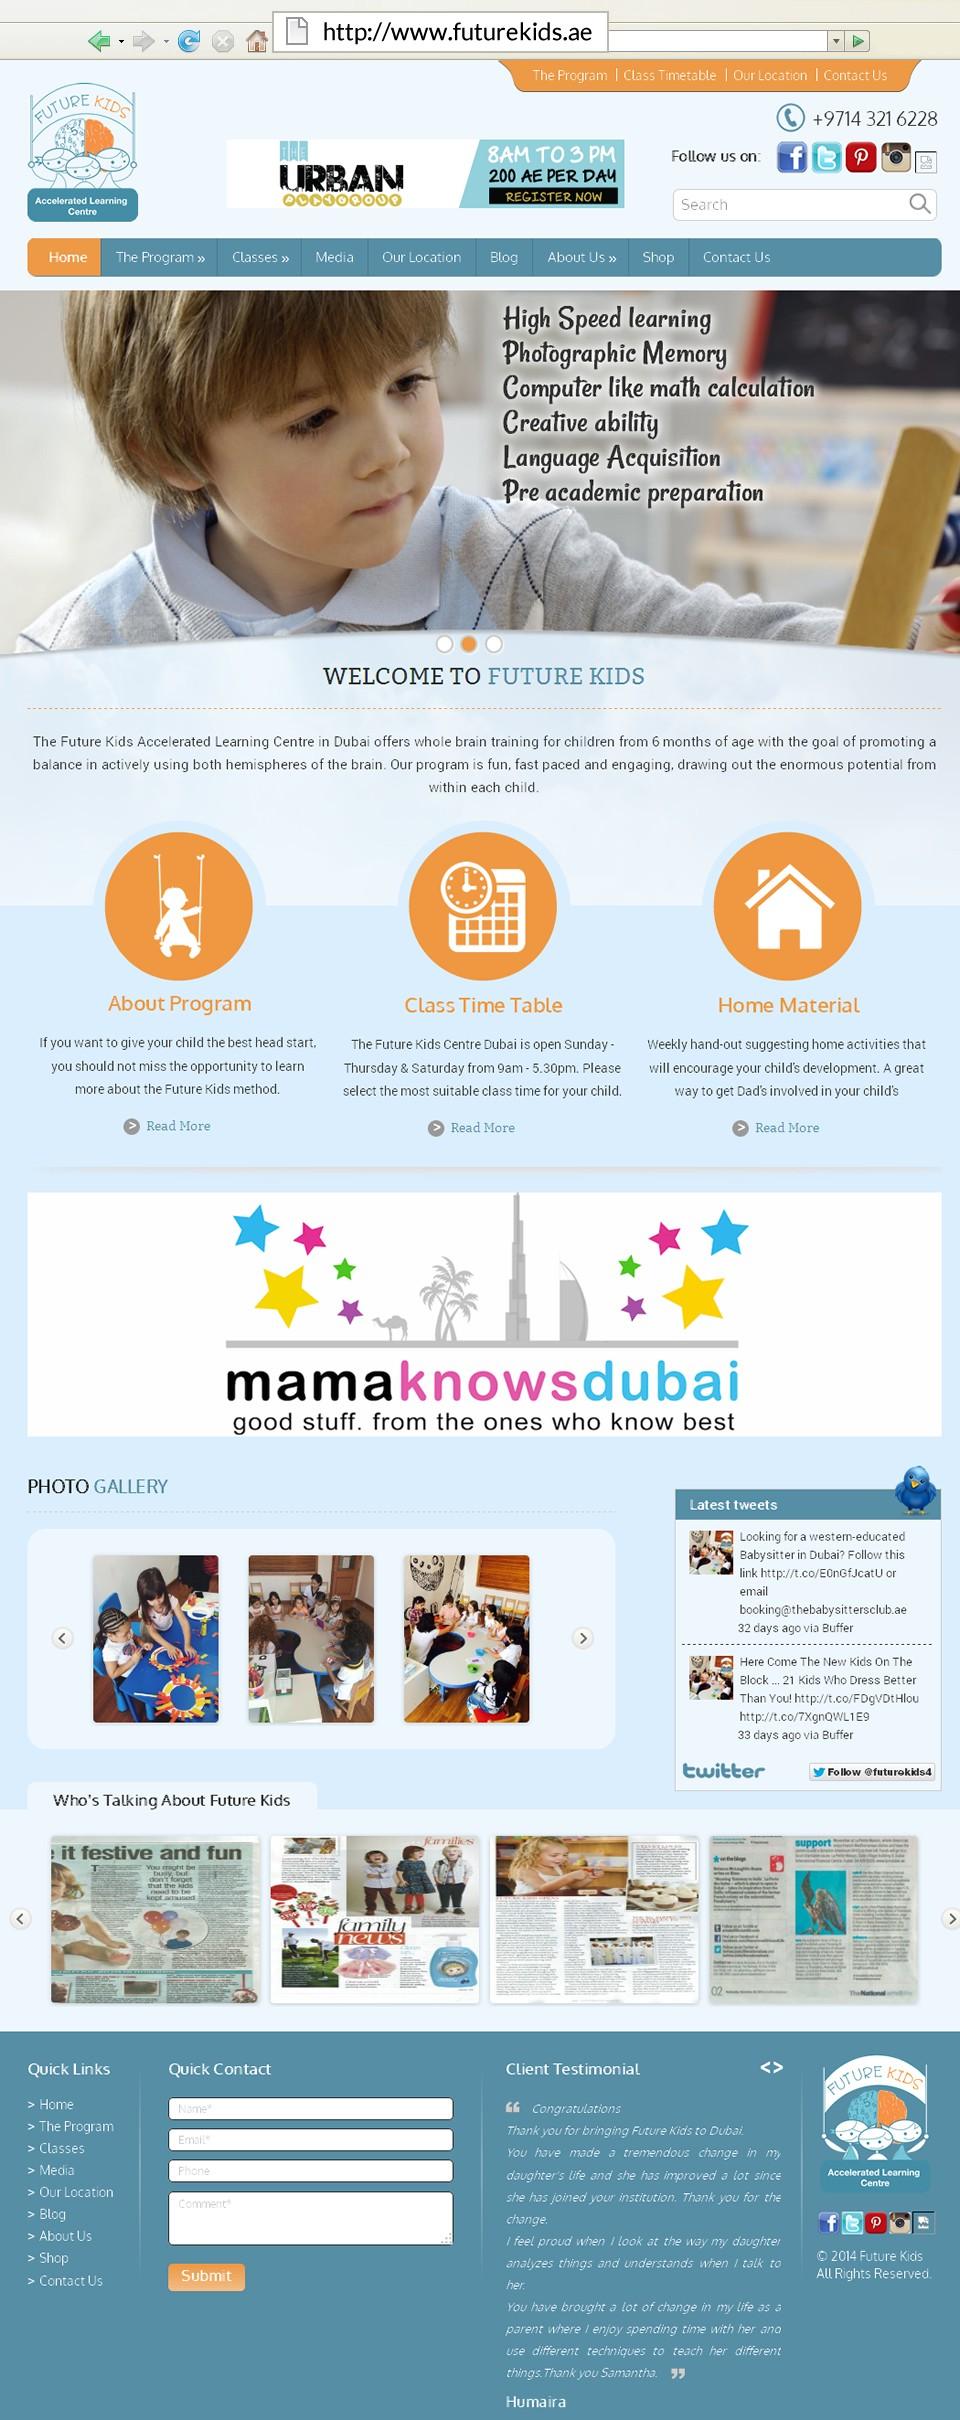 http://www.smartinfosys.net/49586/future-kids.jpg